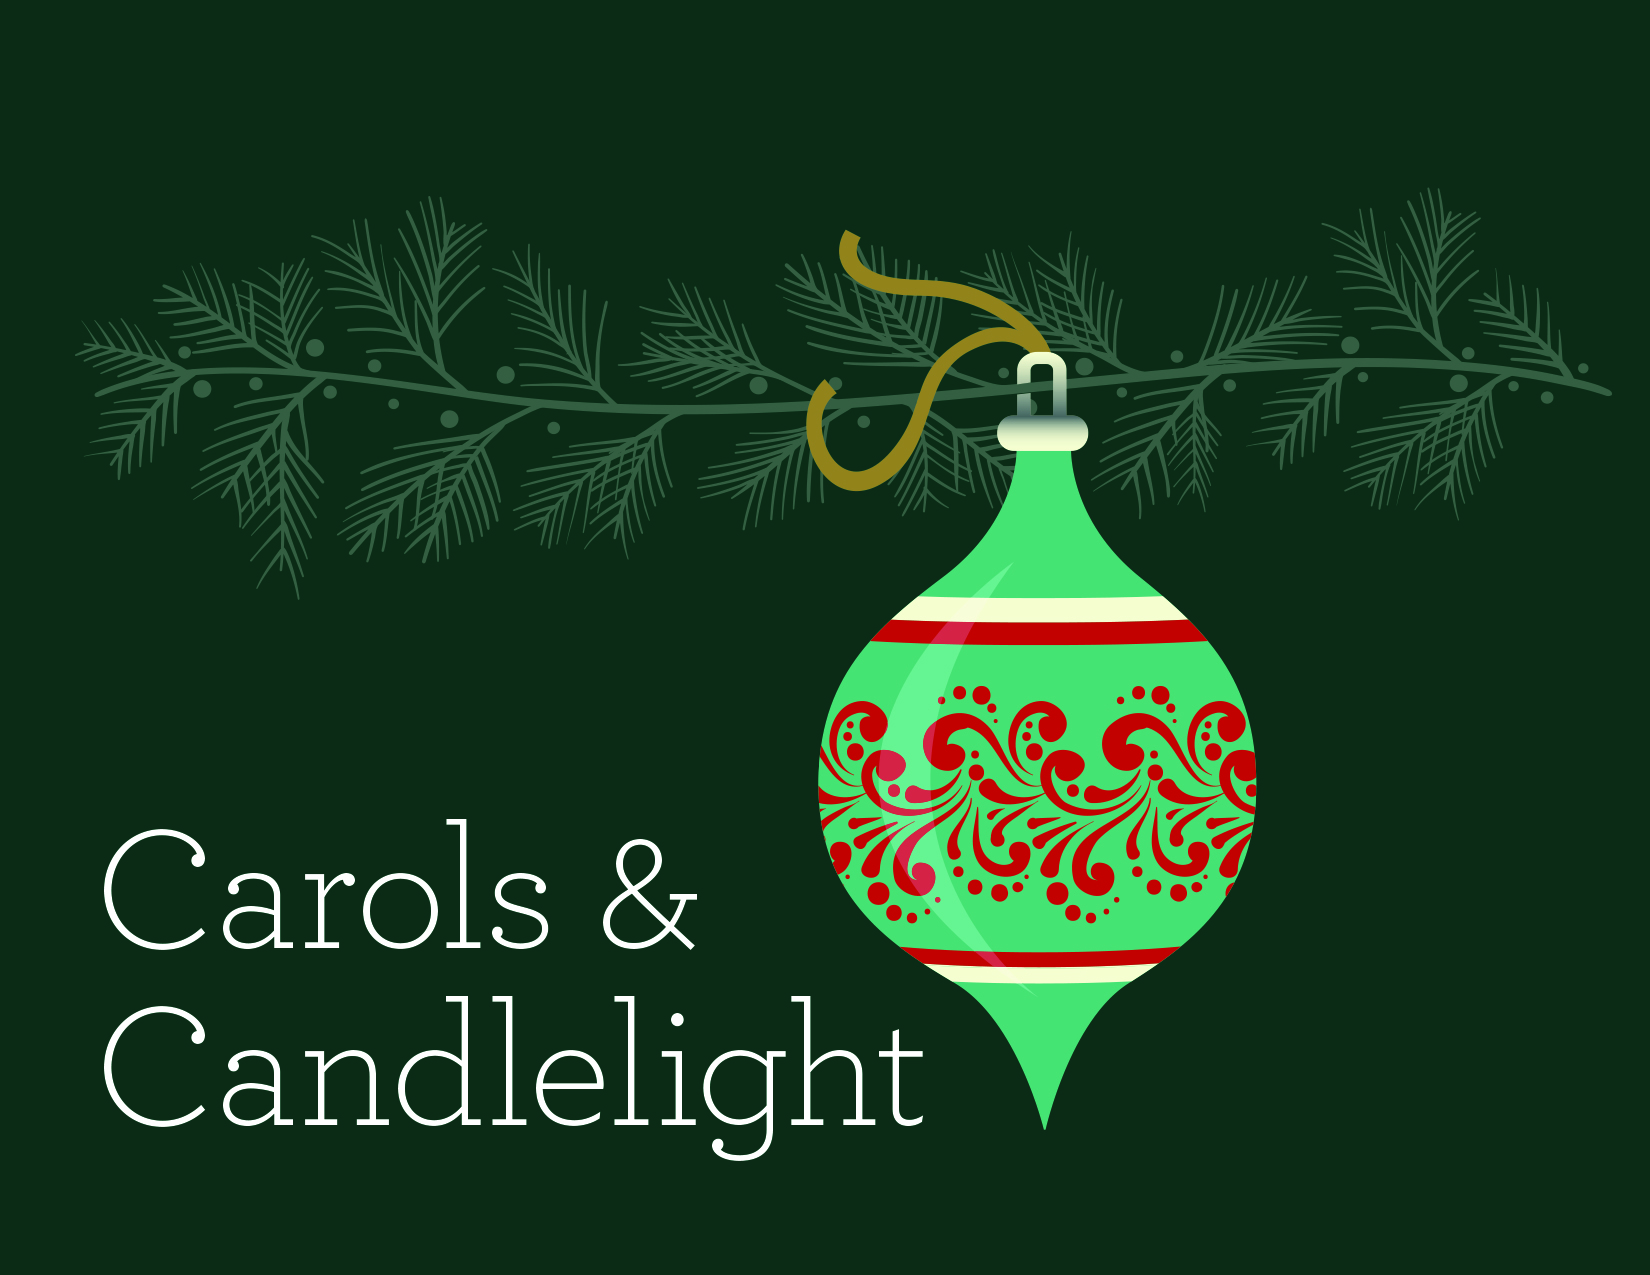 carols&candlelight.jpg